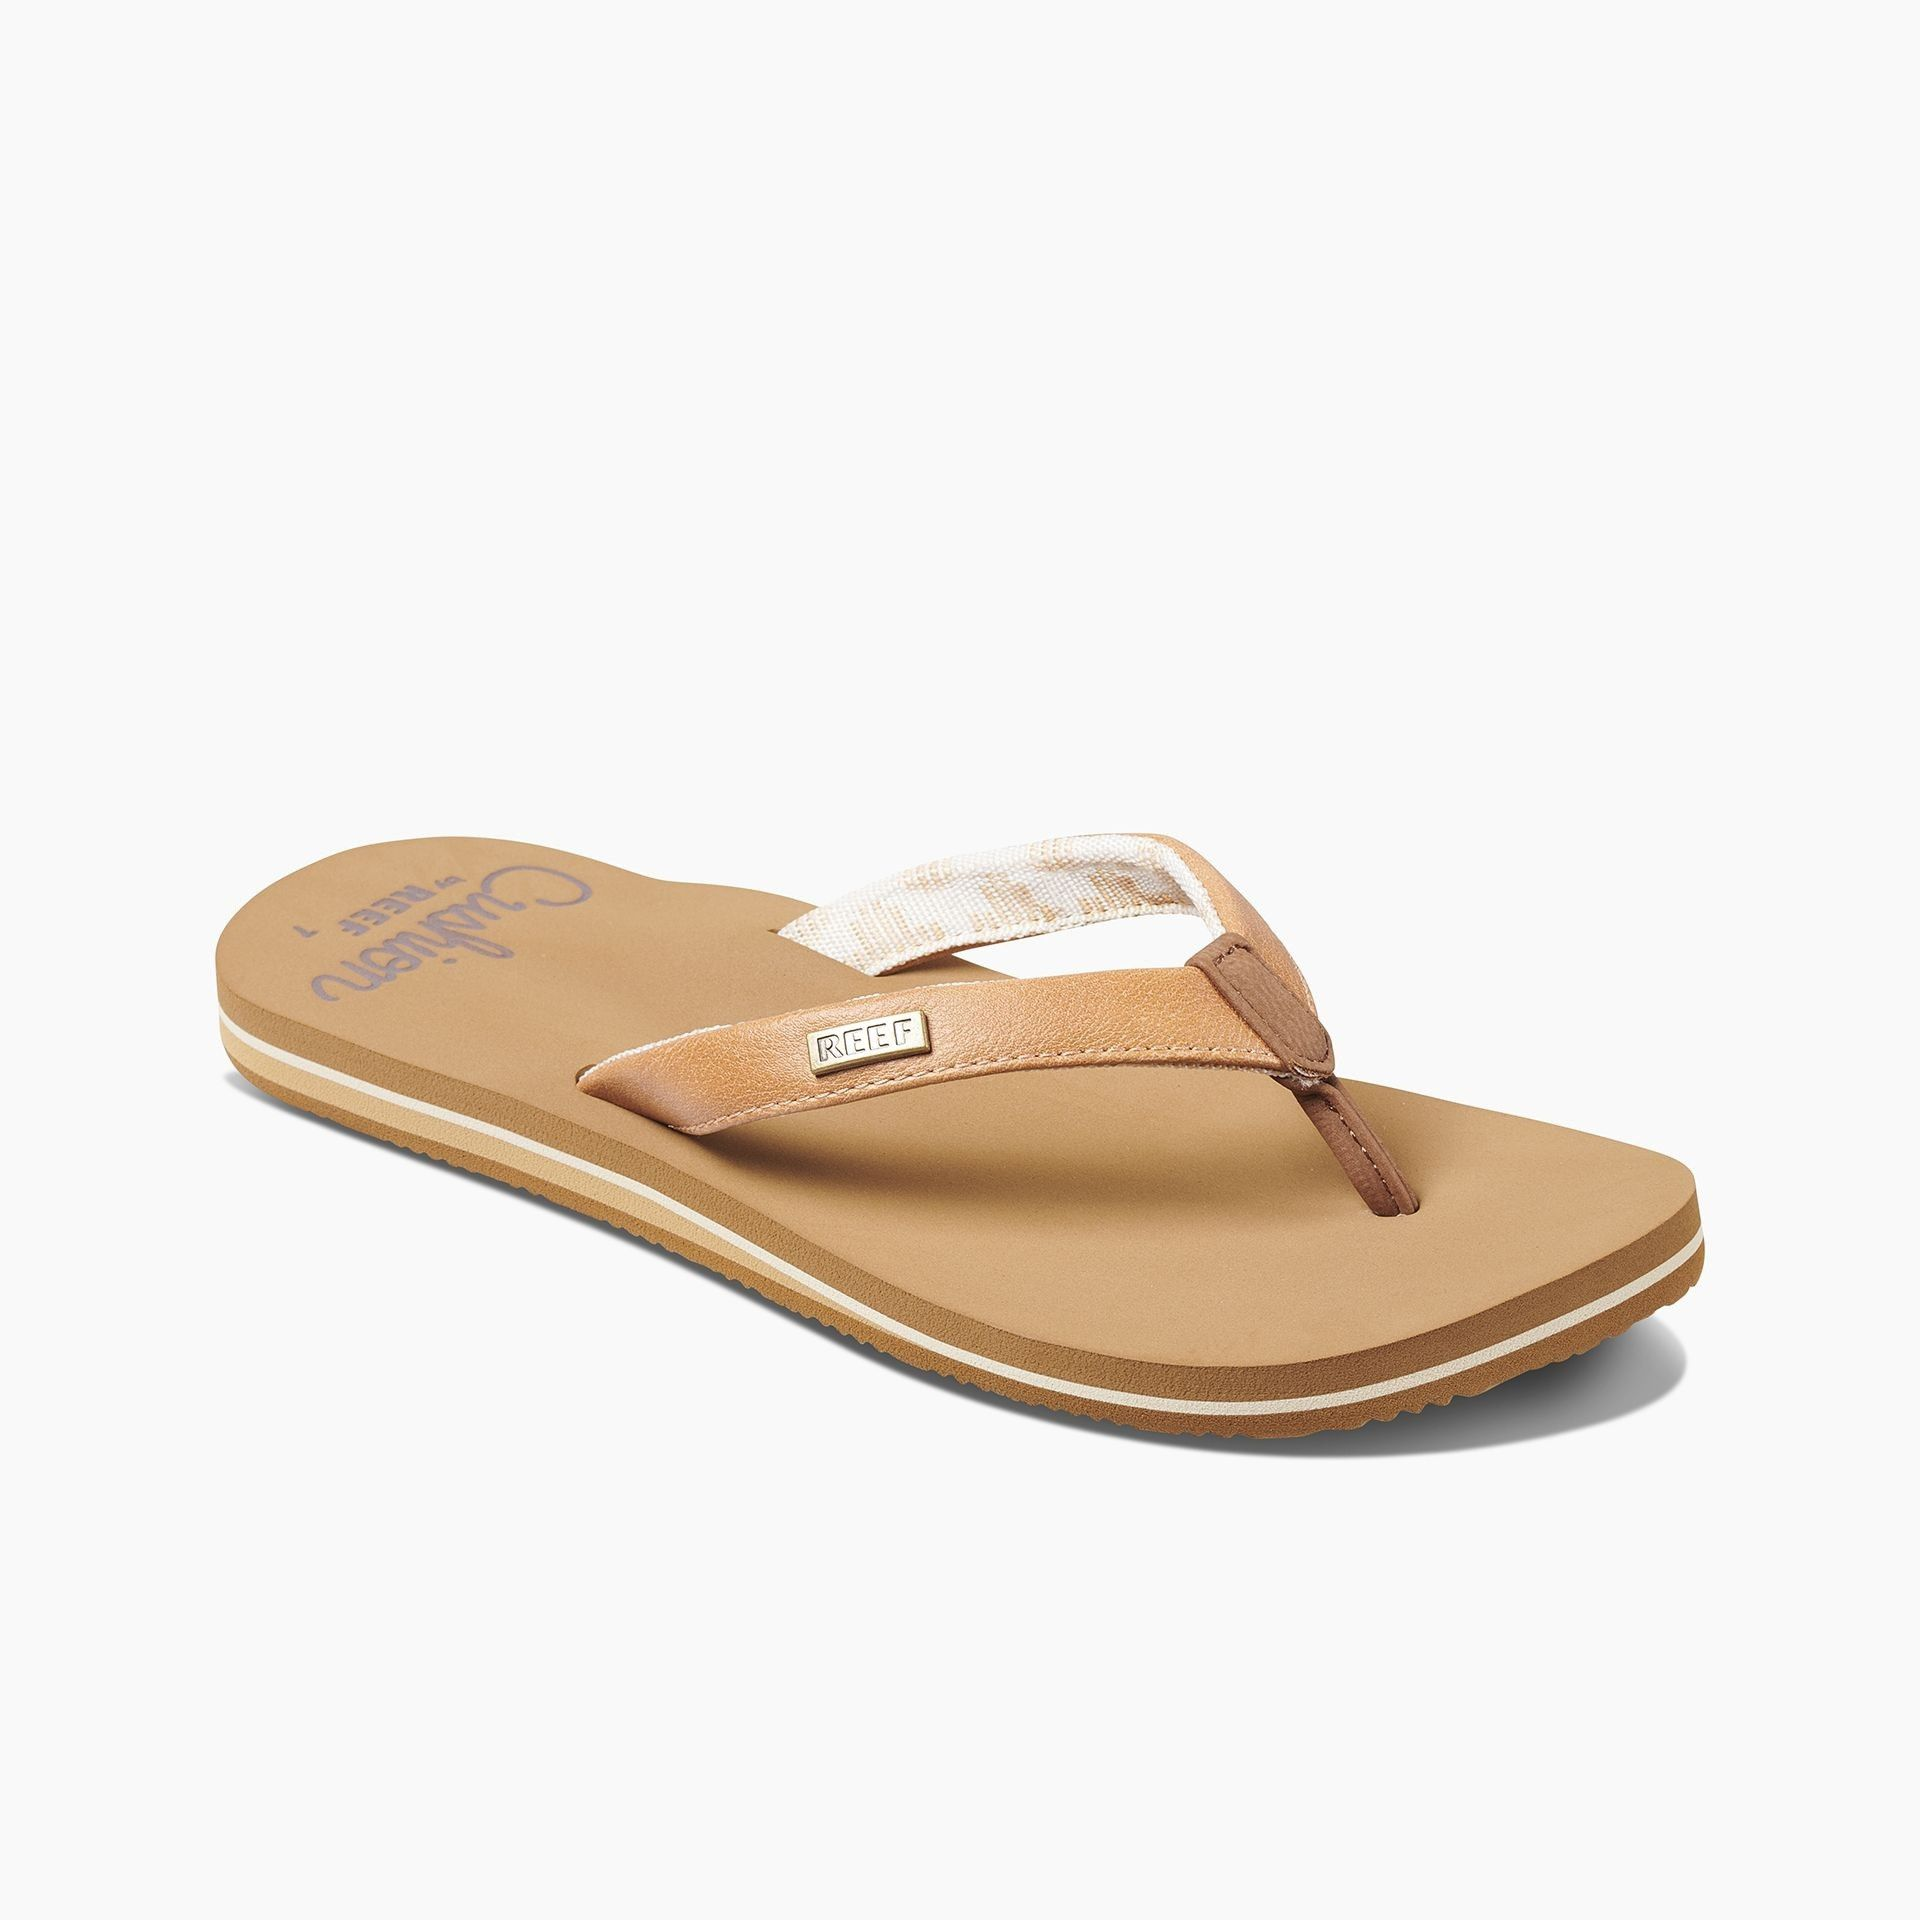 Reef dames slipper Cushion Sands